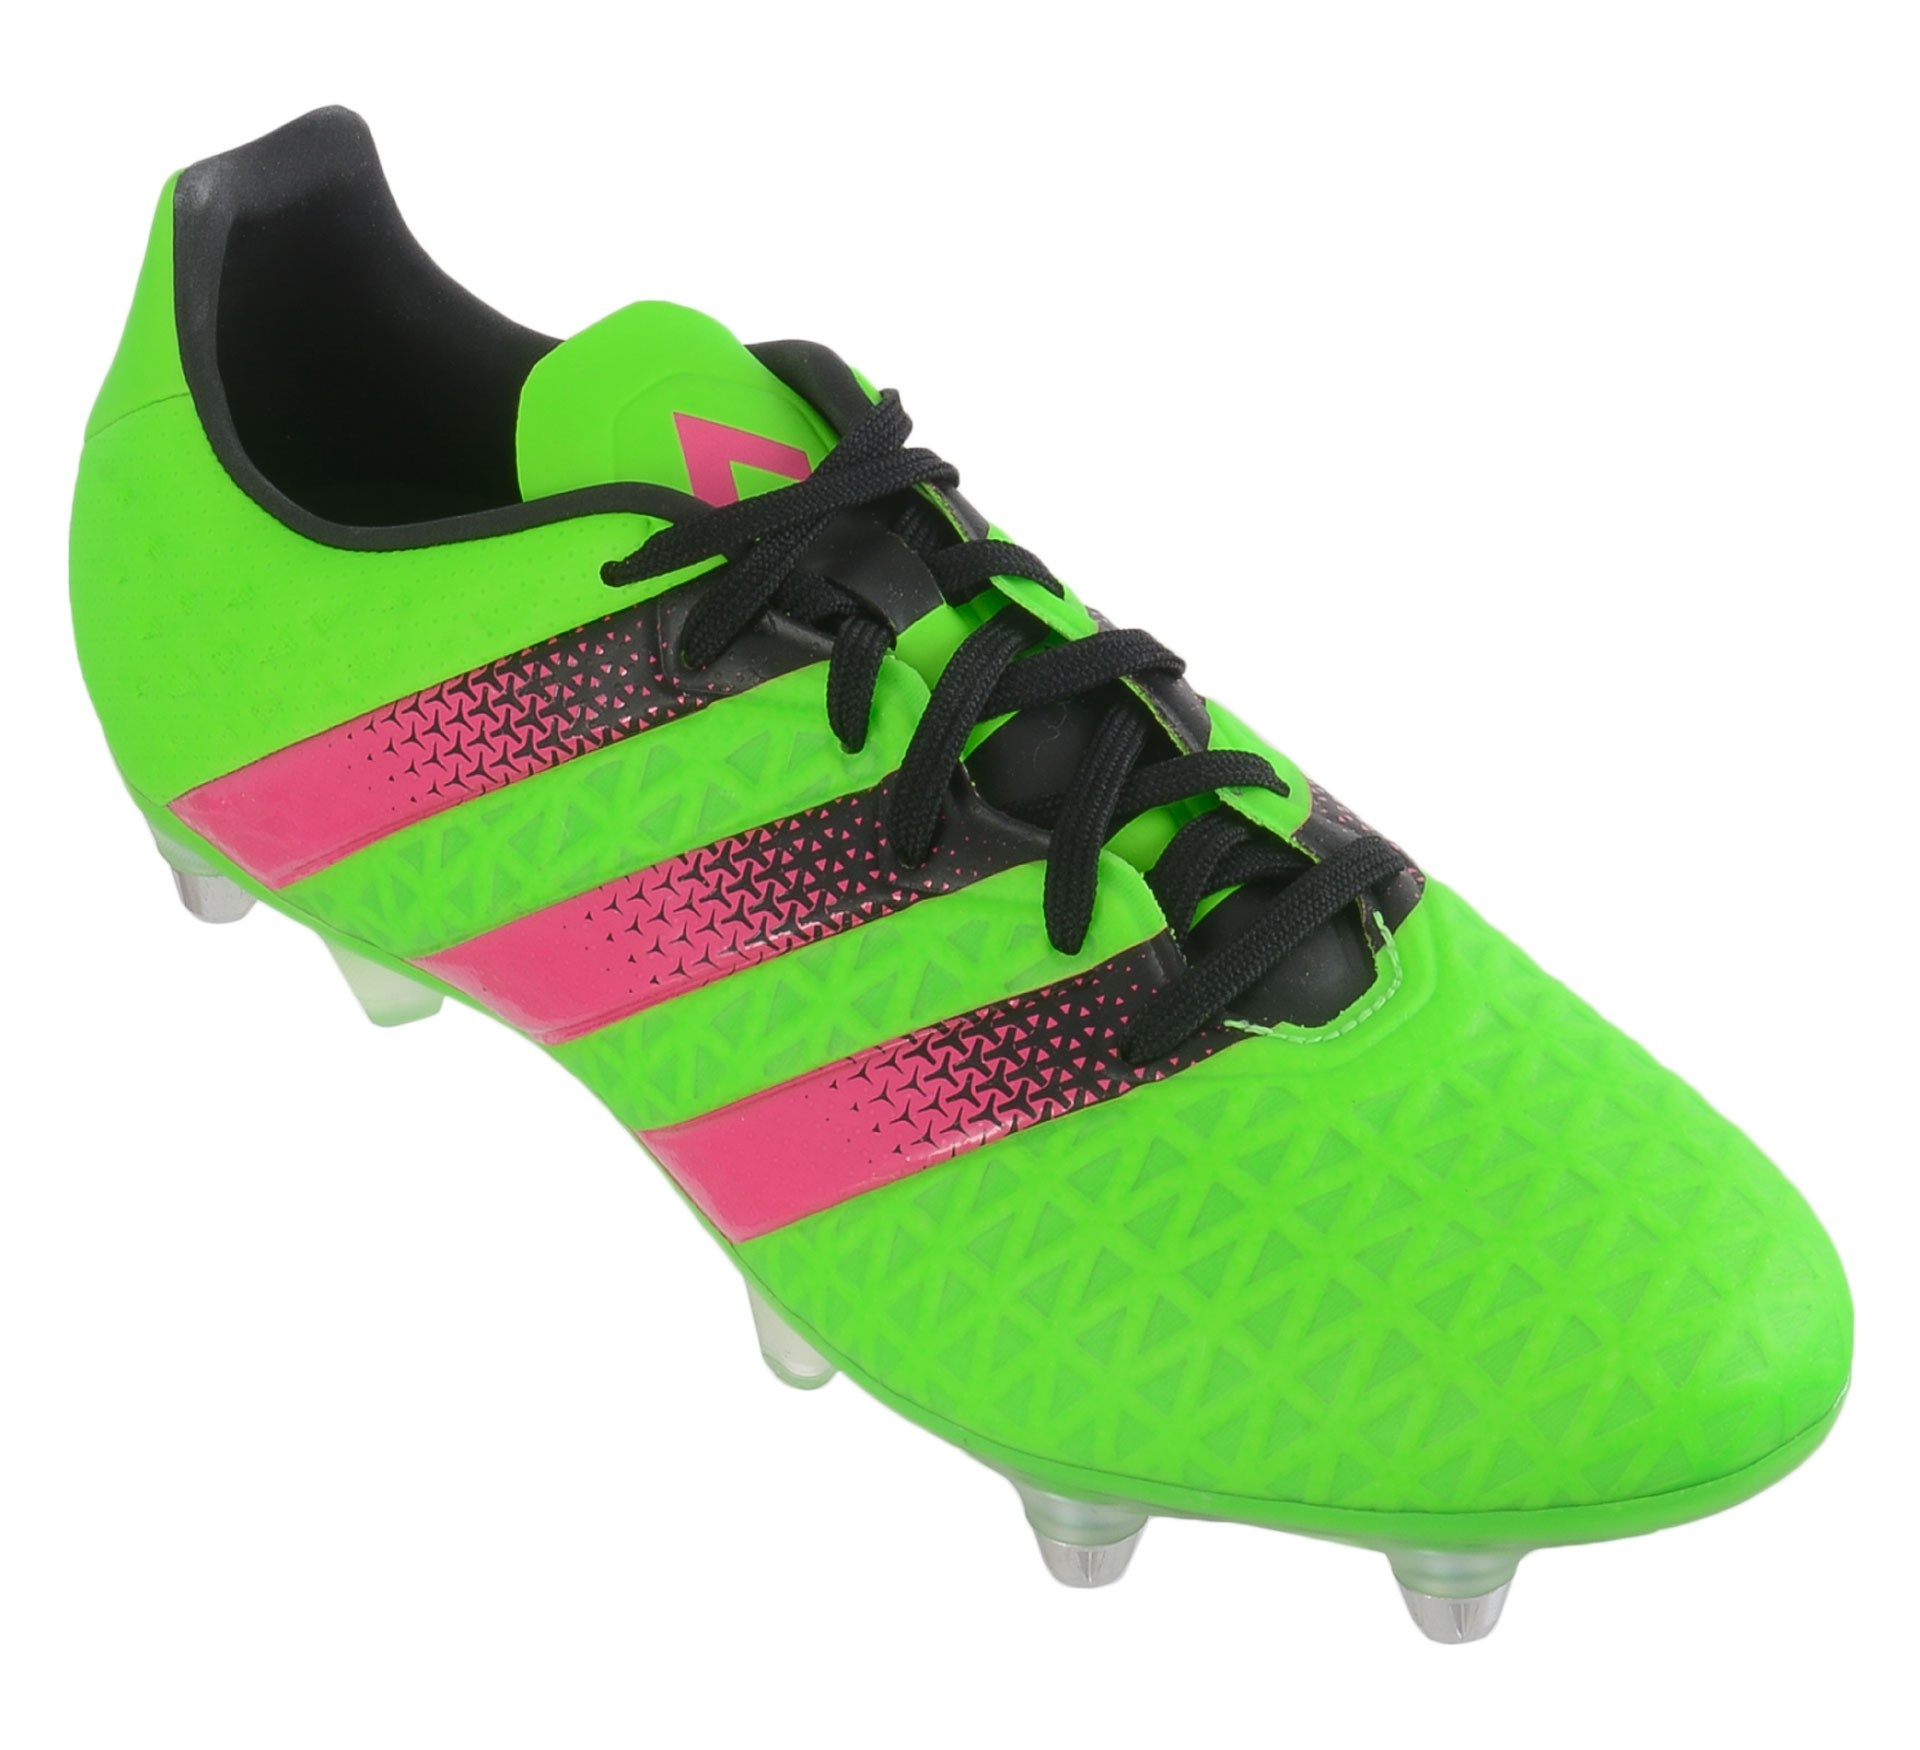 huge selection of 17d7d 14833 adidas soccer Ace 16.2 SG men green - Internet-Sport&Casuals